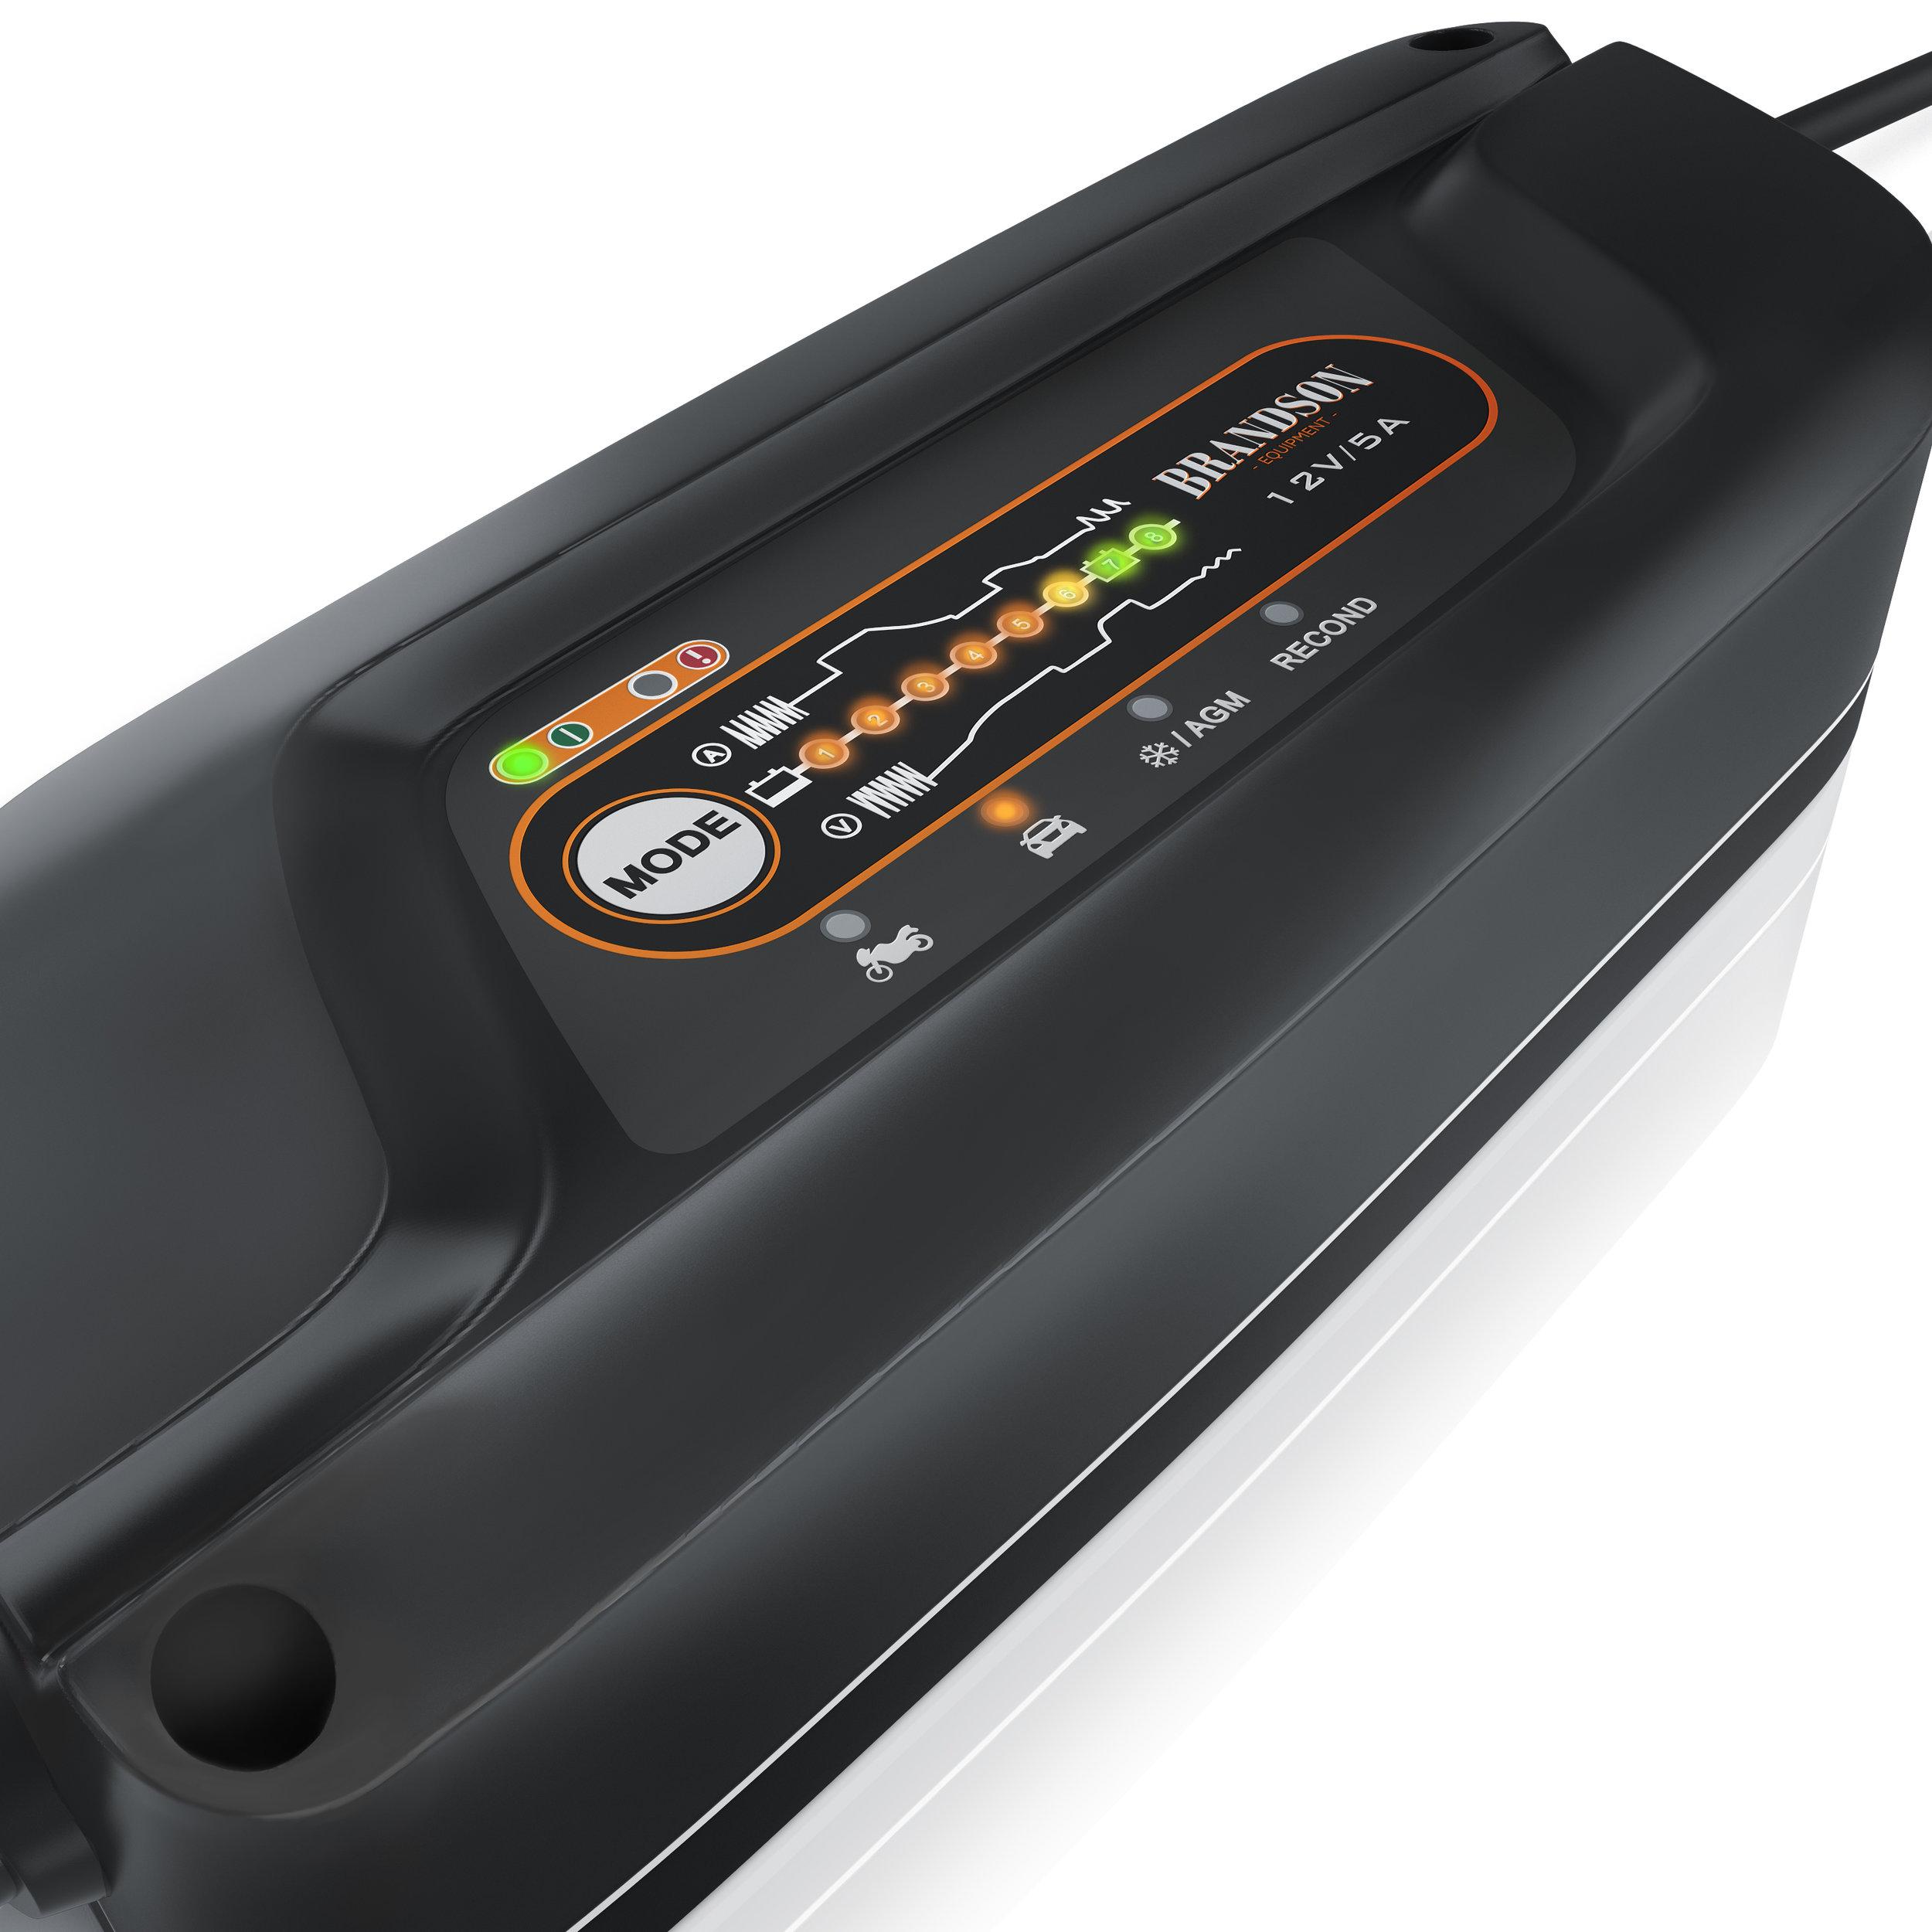 302423-battery-charger-nah.jpg